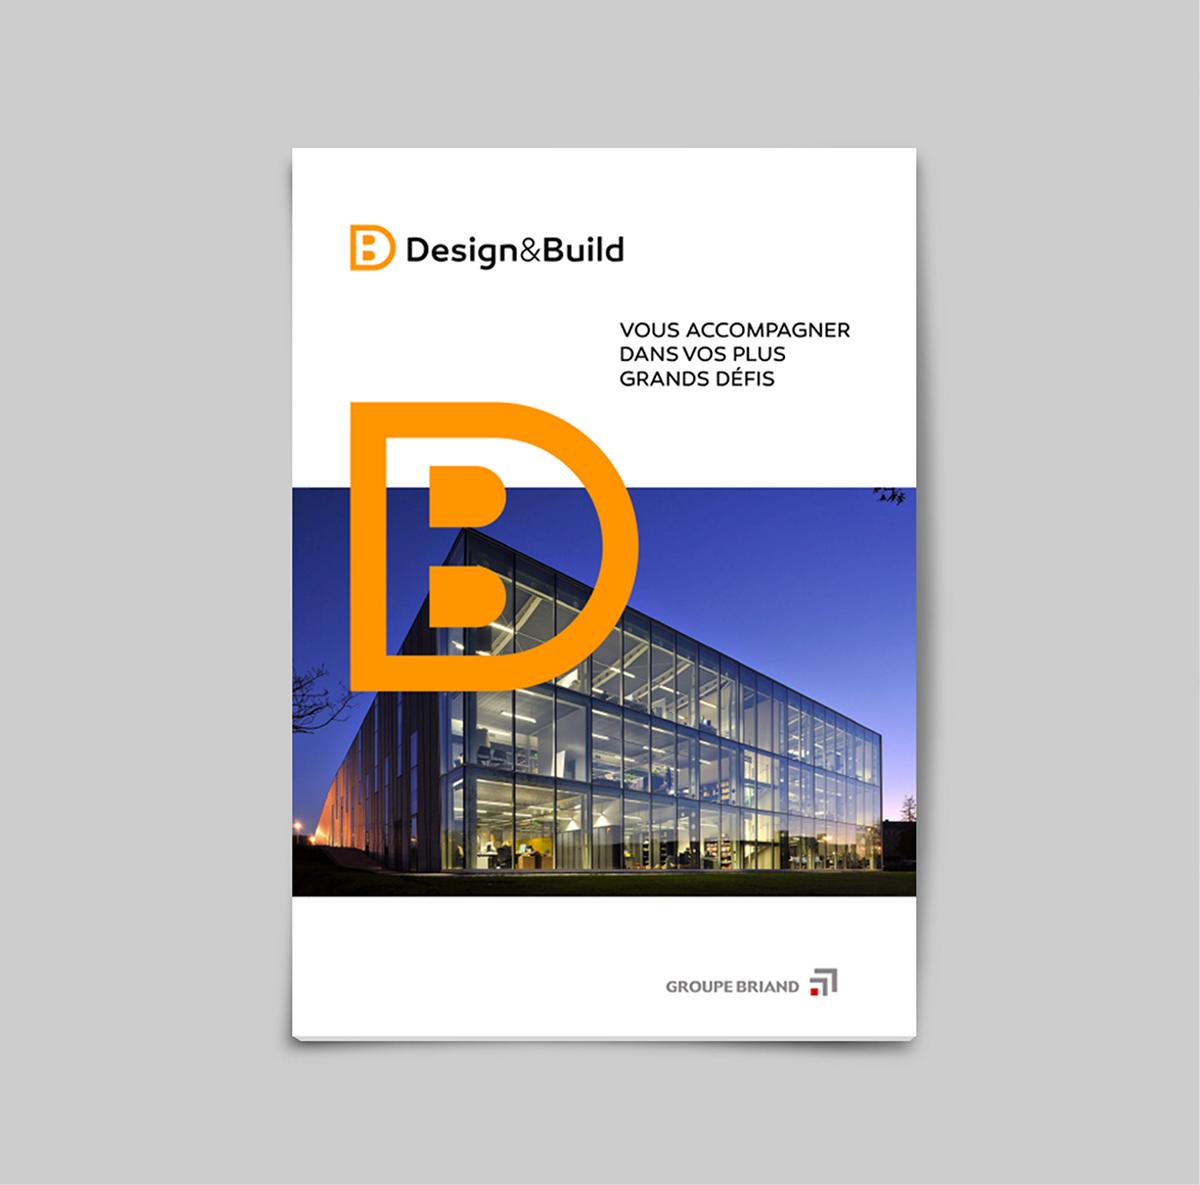 Catalogue Design & Build - Groupe Briand